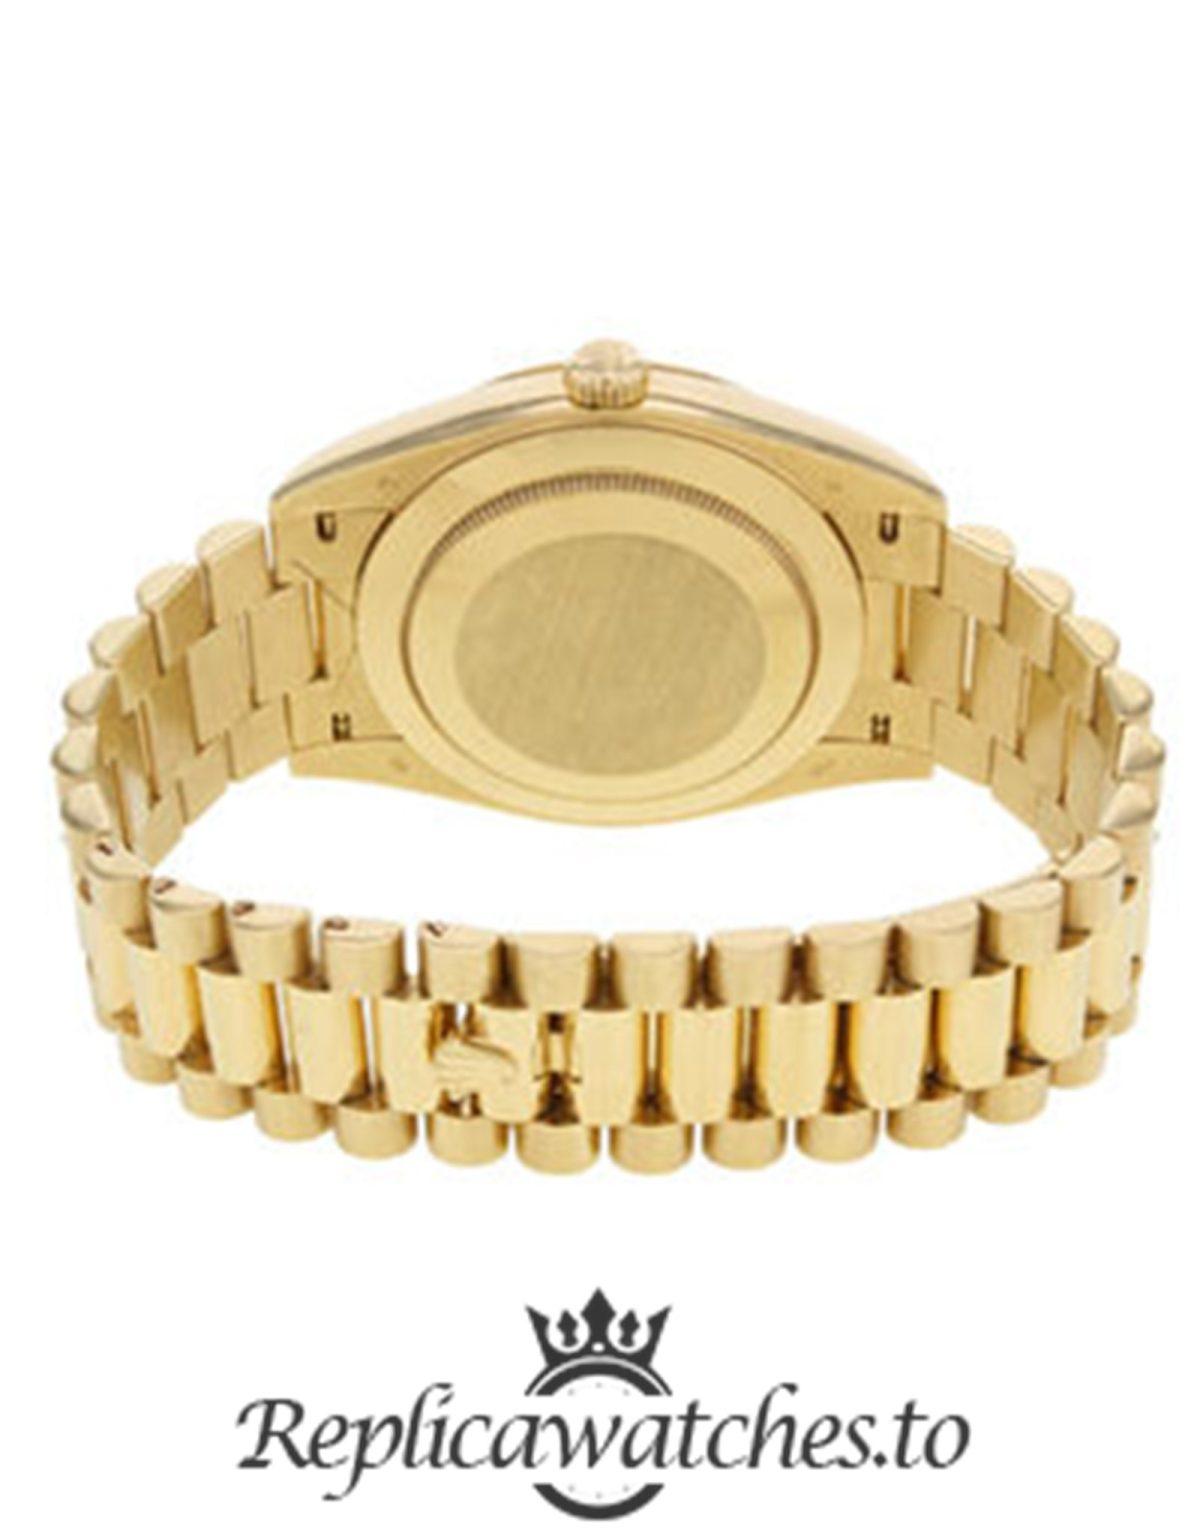 Rolex Day Date Replica 228238 001 Yellow Gold Strap 40MM